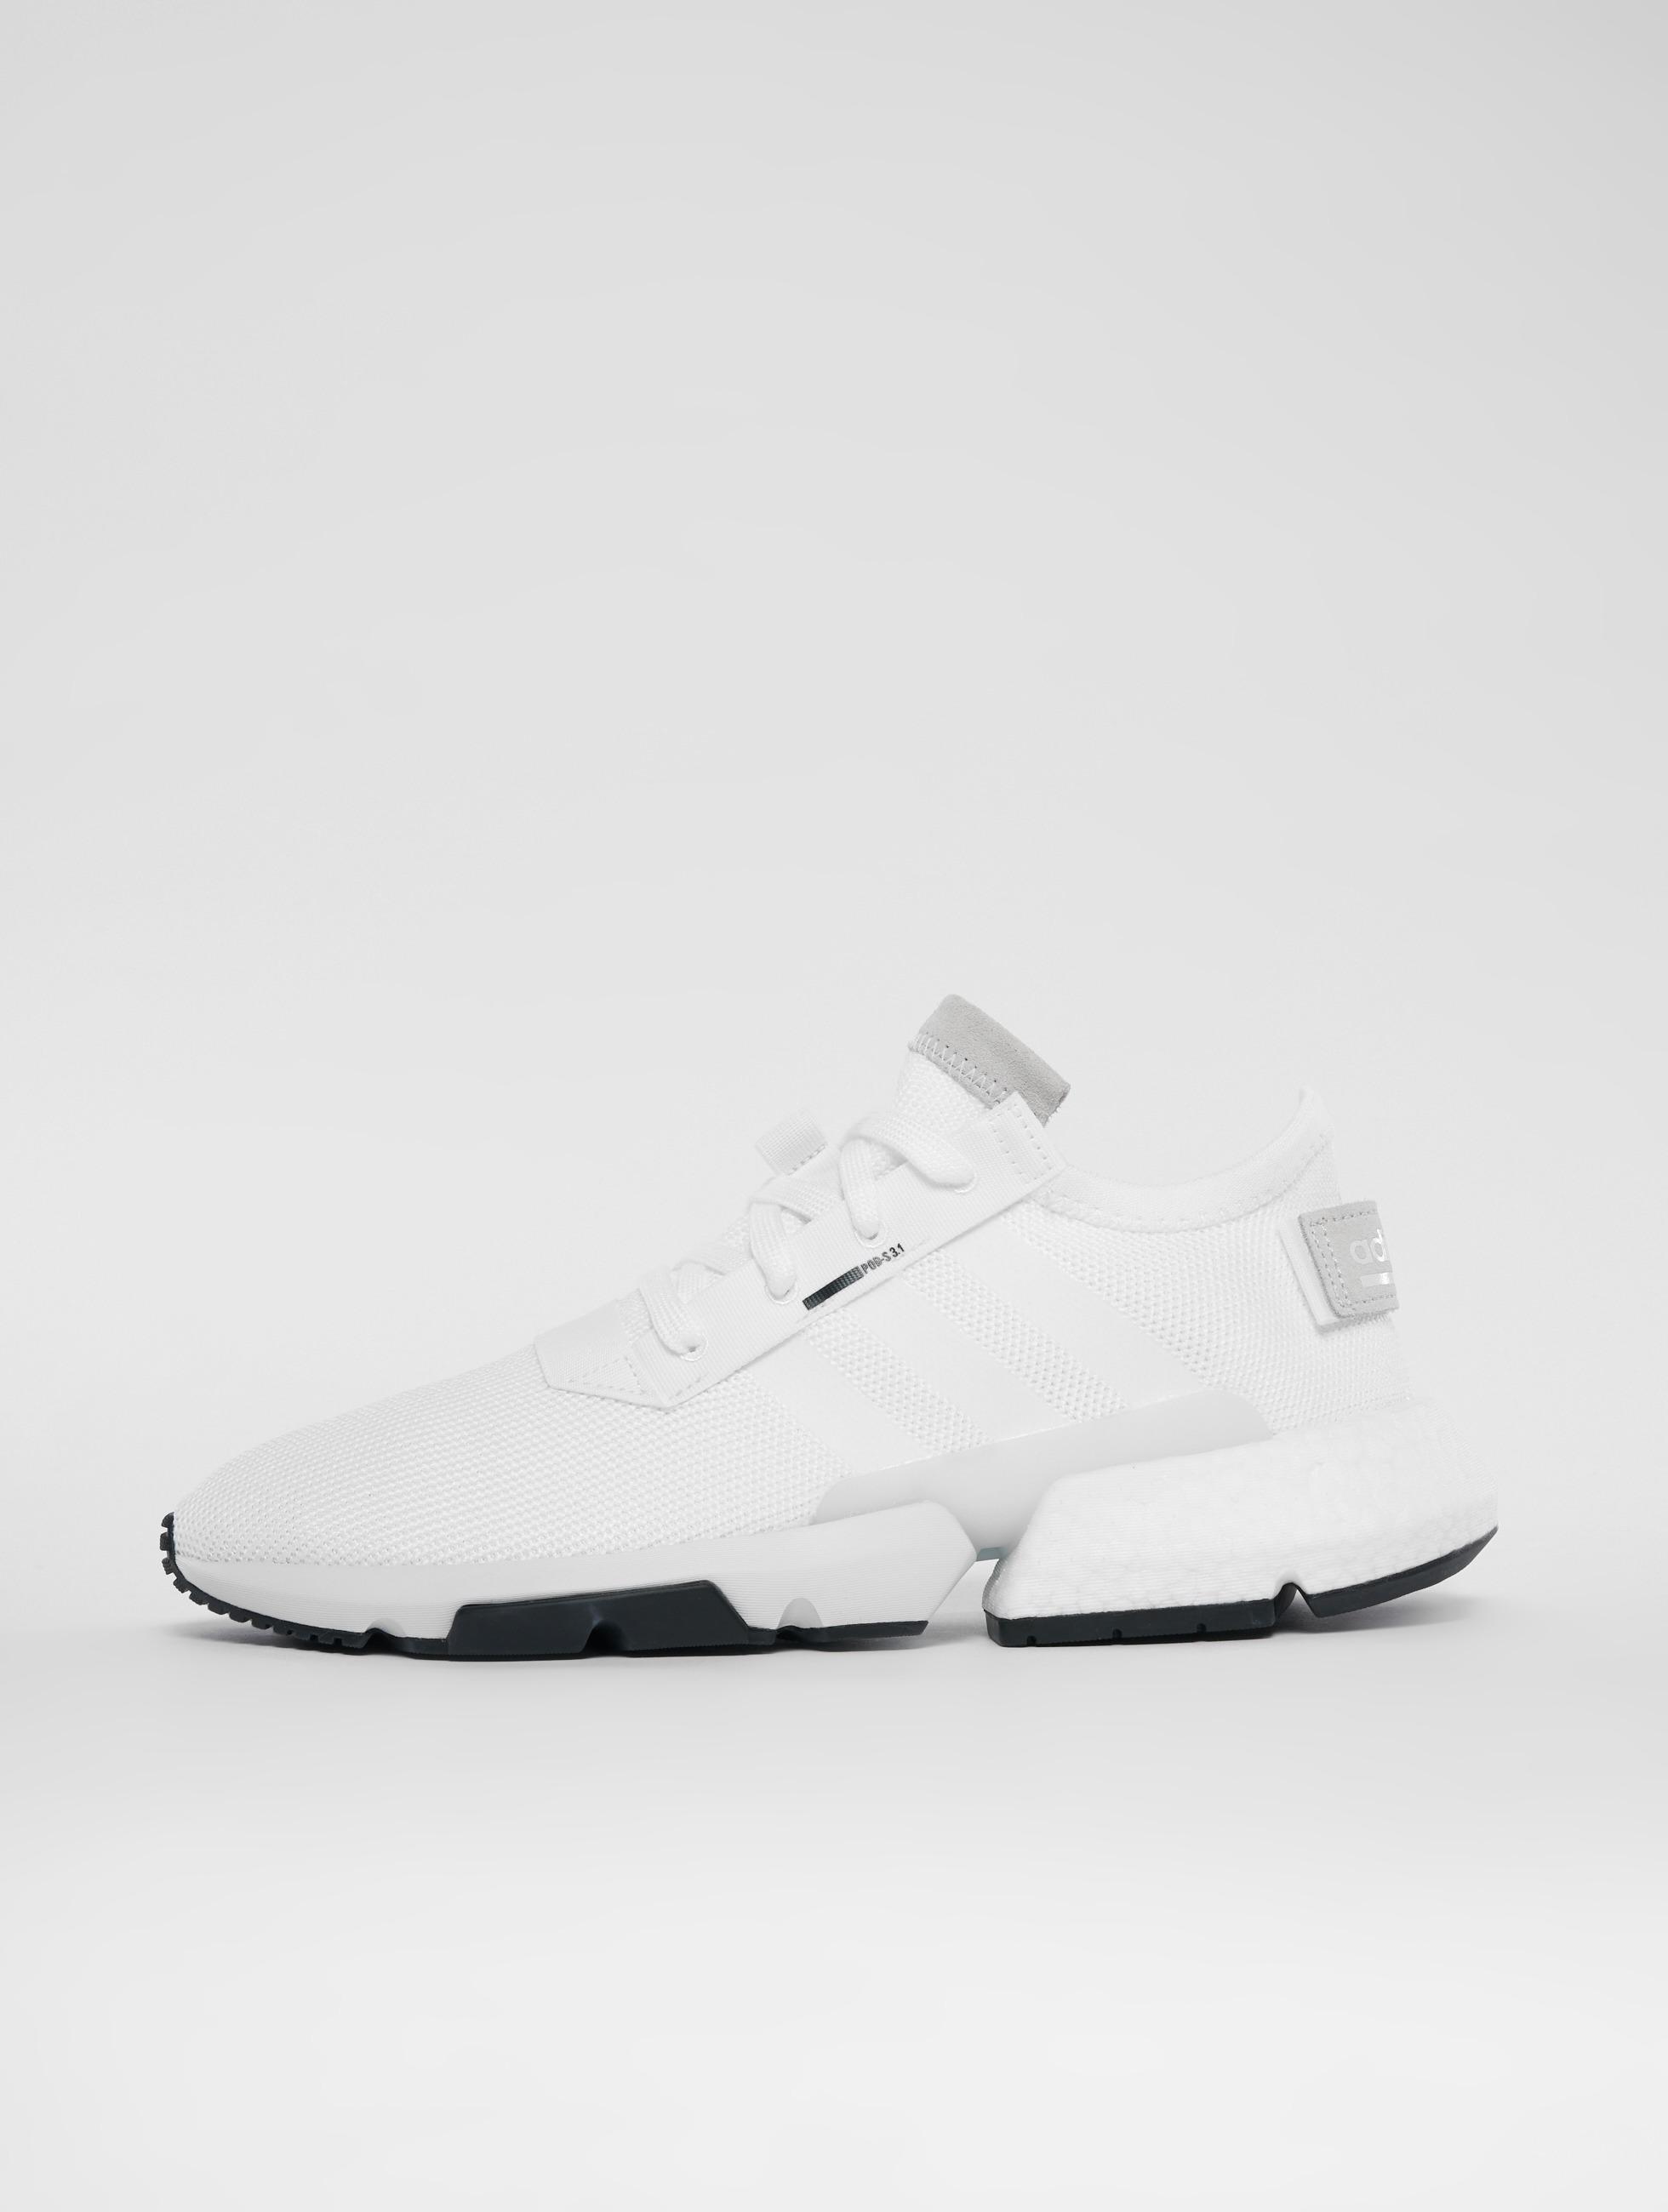 ed3919d3a9339f adidas originals Herren Sneaker Pod-S3.1 in weiß 498258